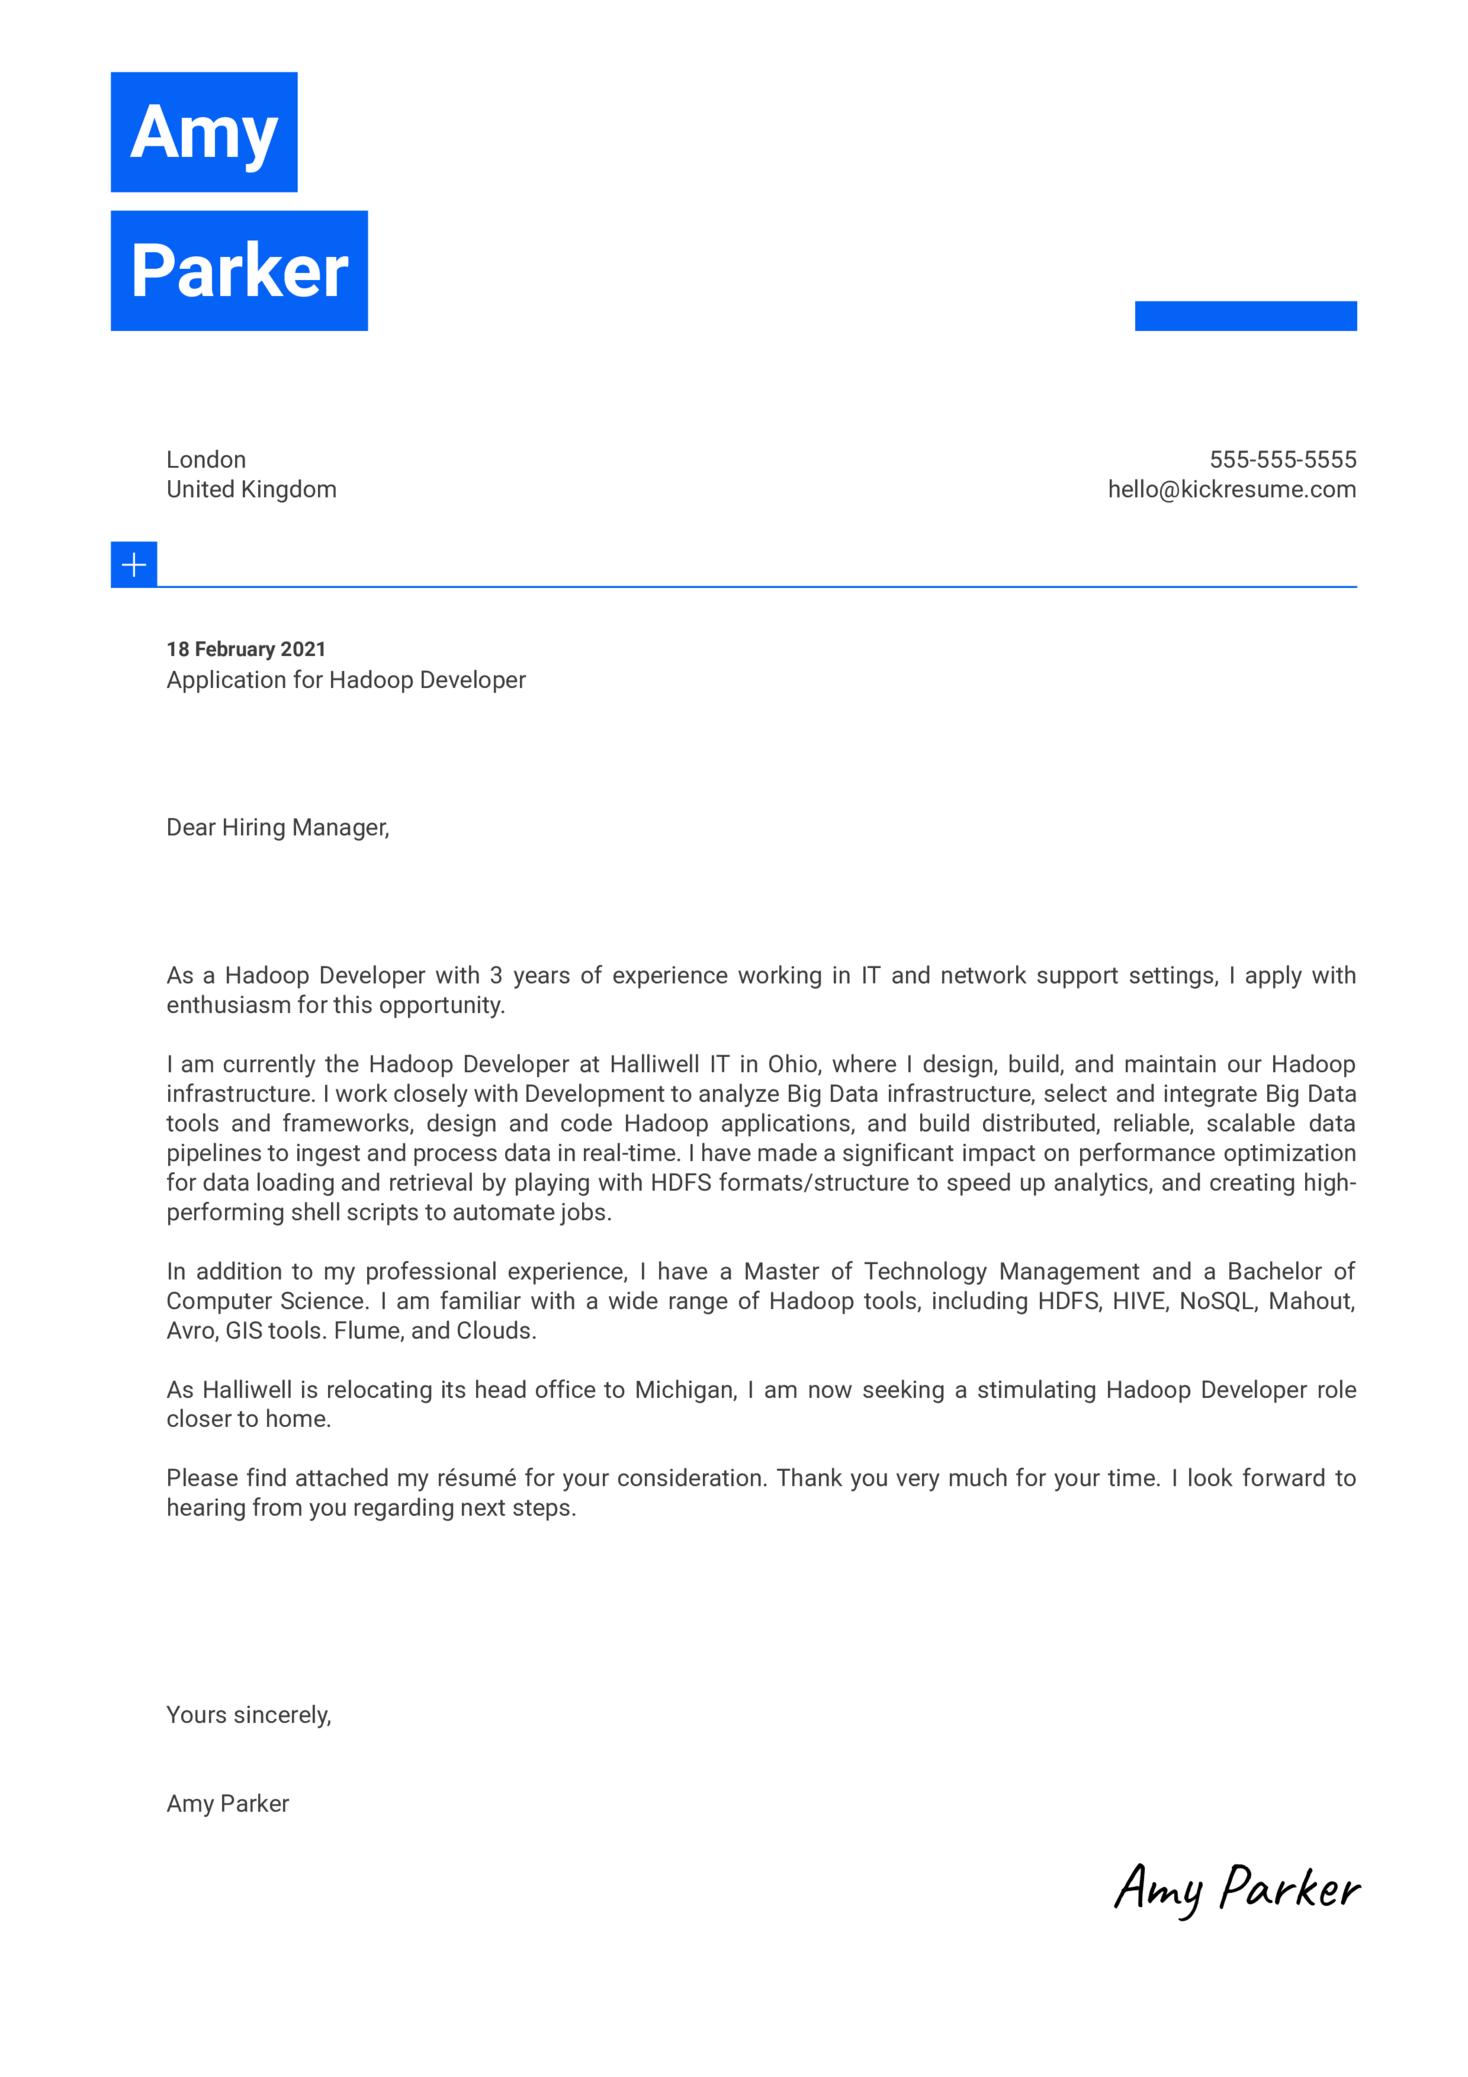 Hadoop Developer Cover Letter Template